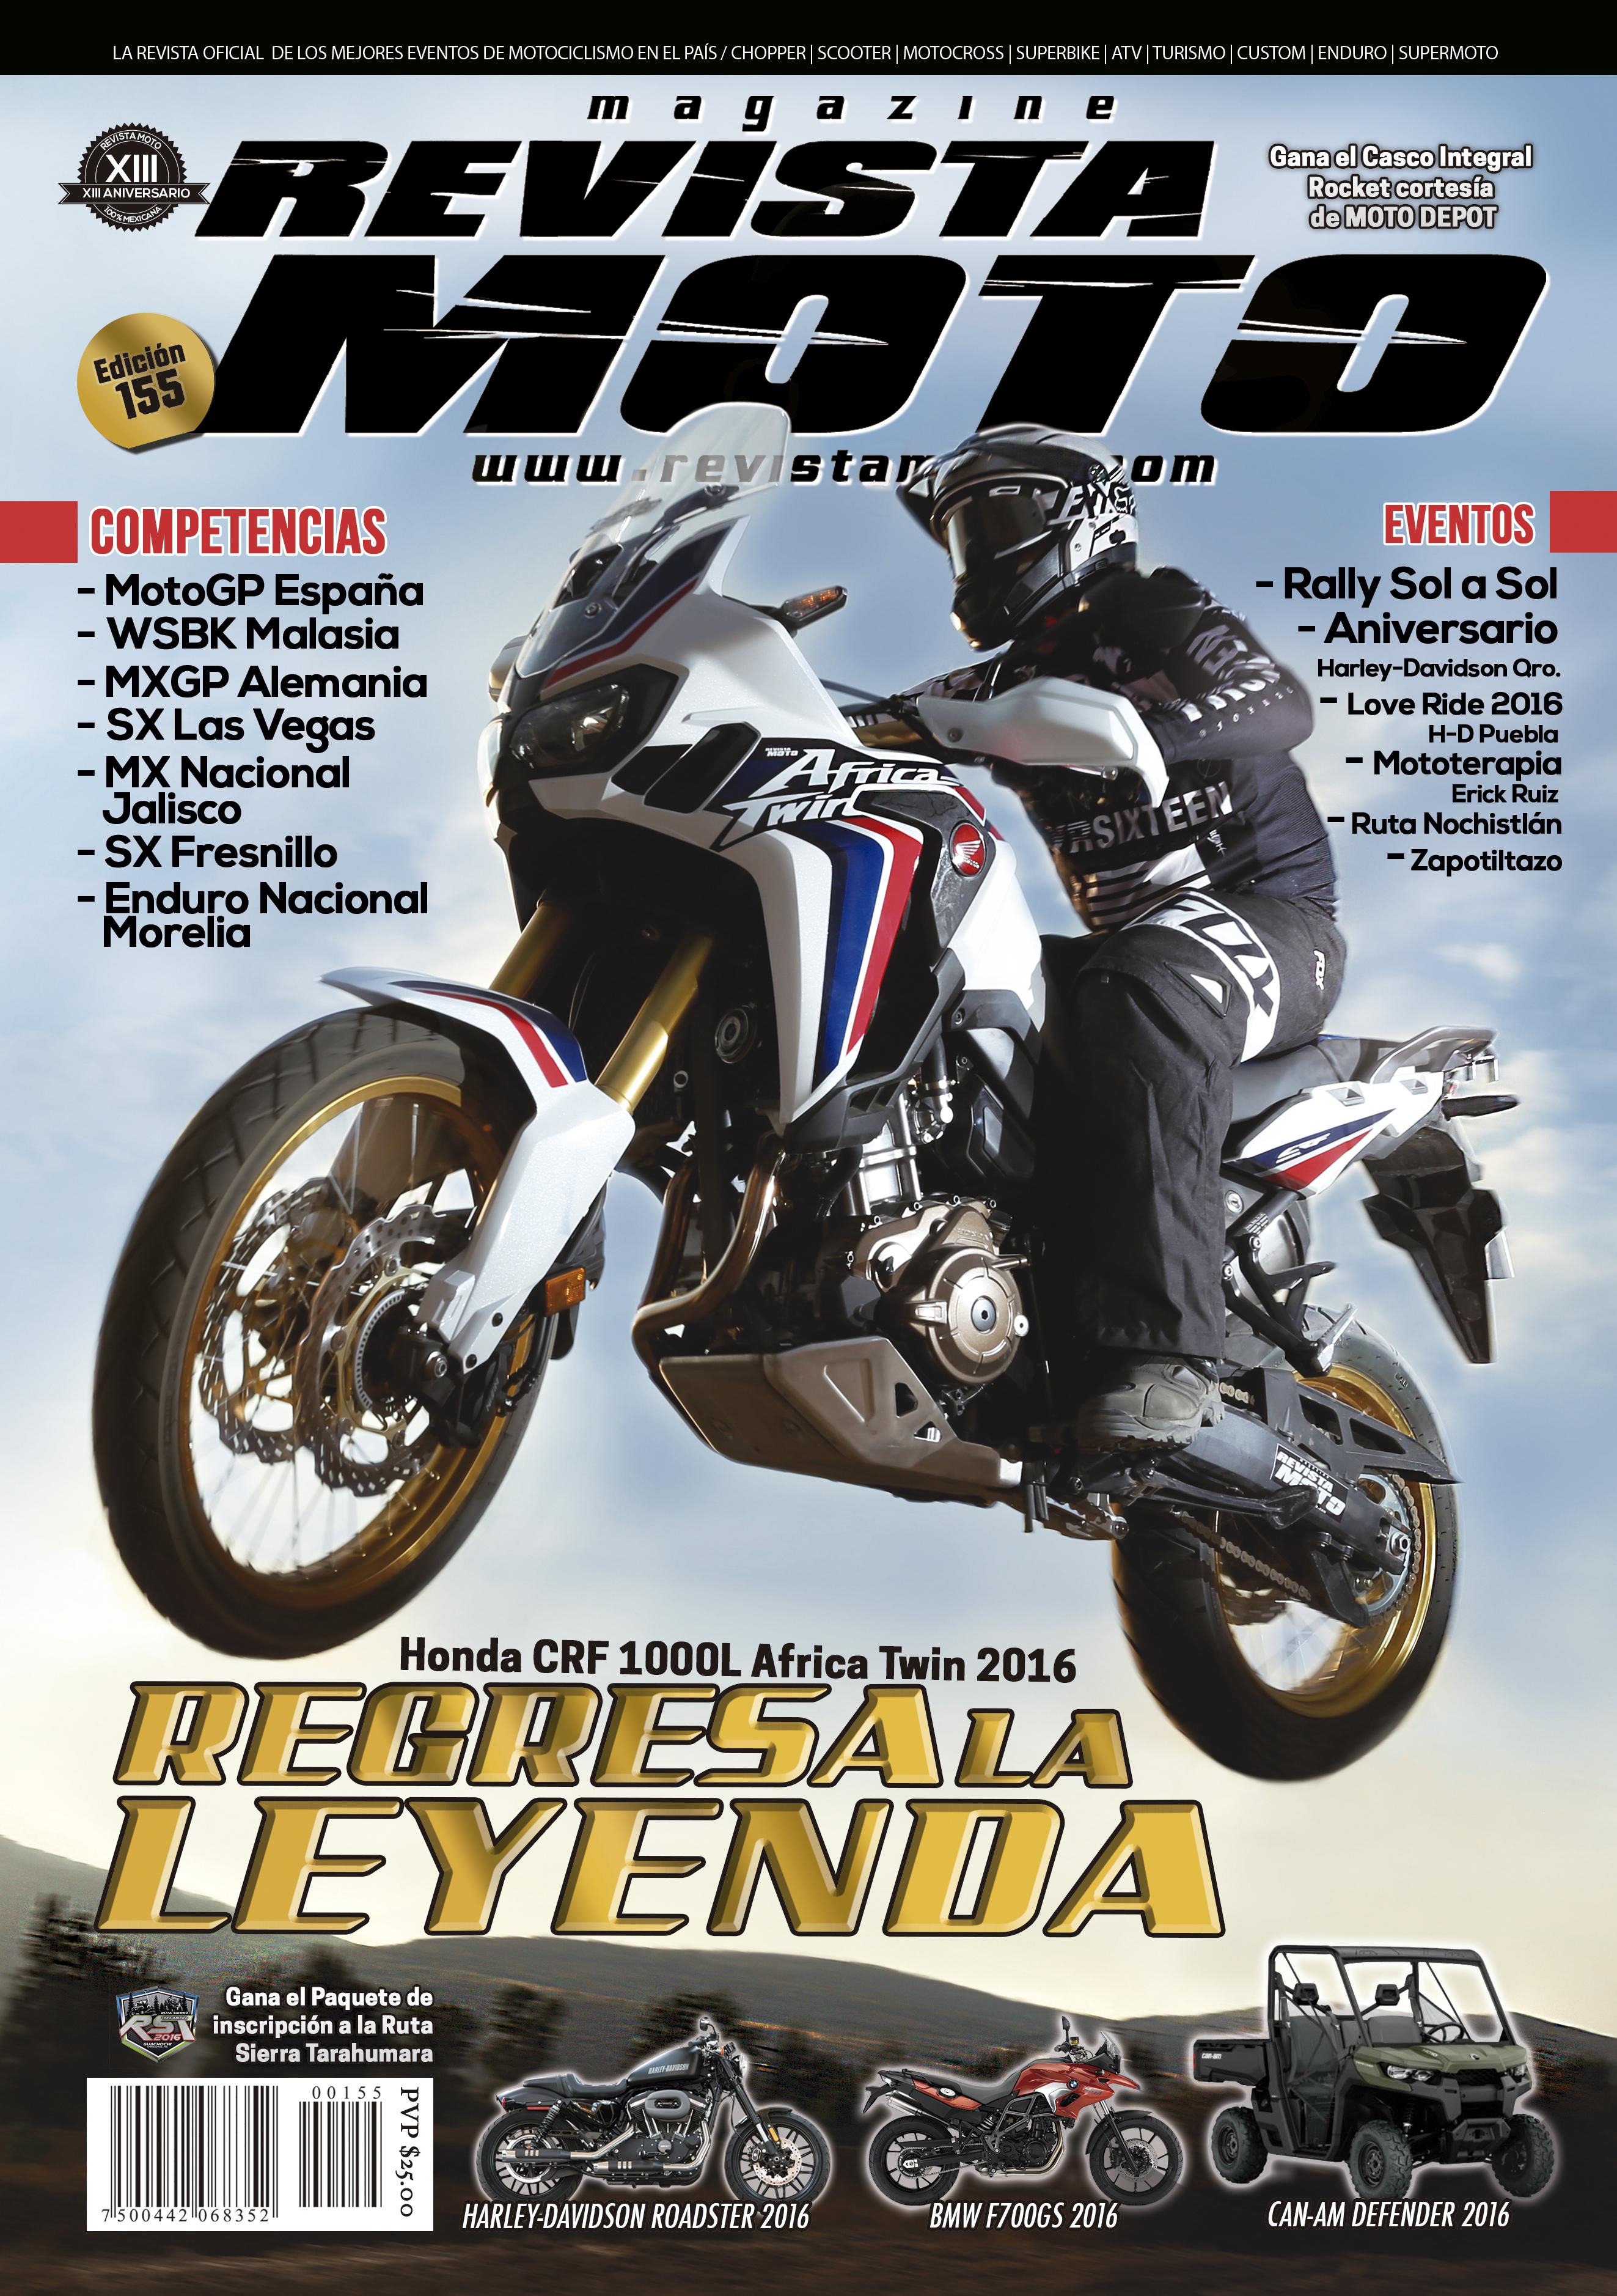 COVER 155 JUNIOFAMA